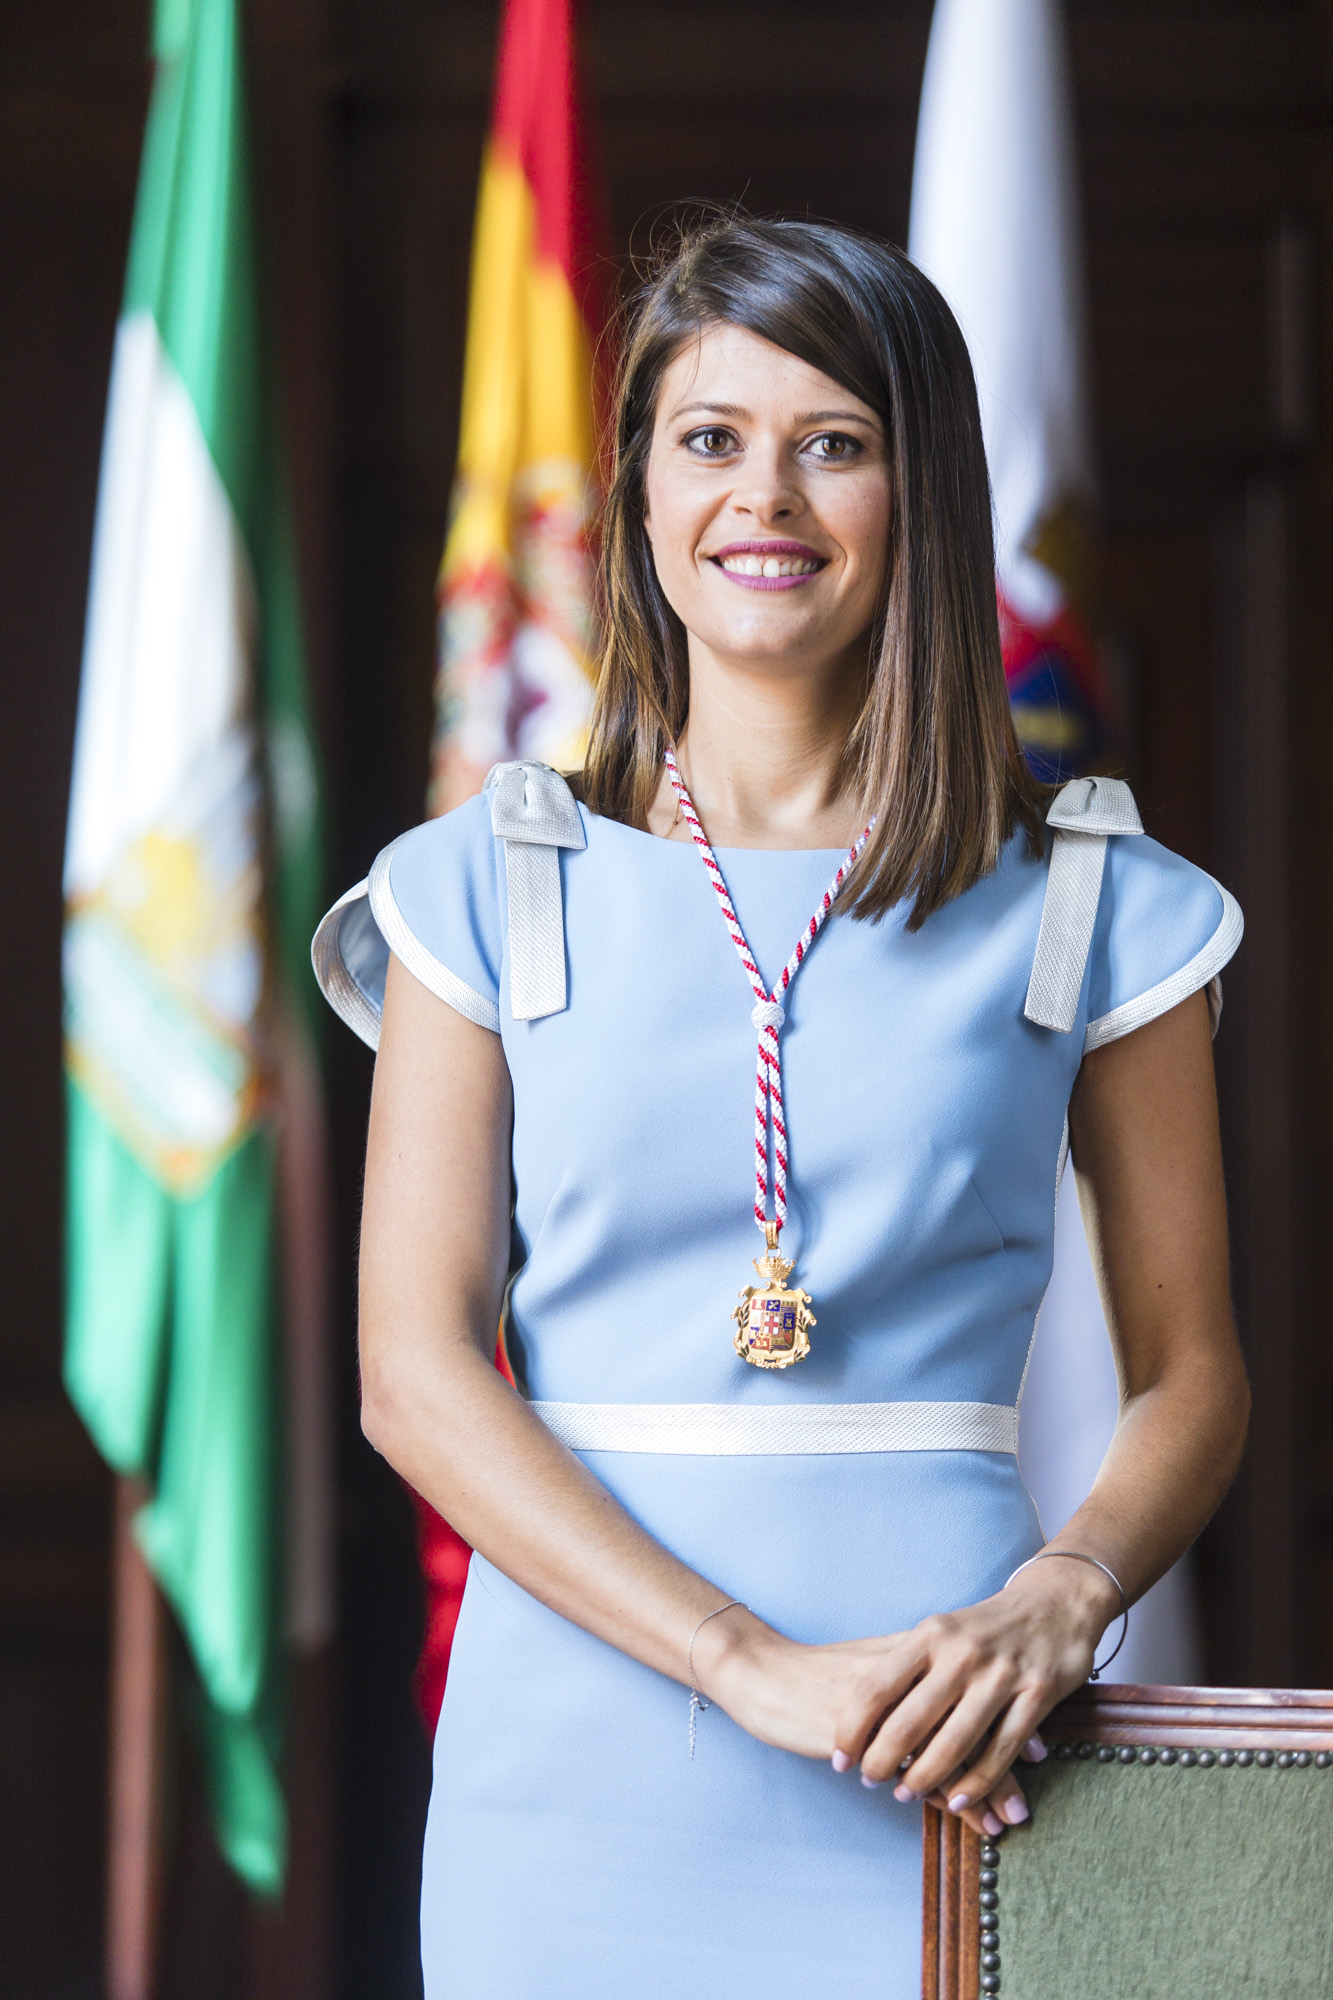 Ángeles Martínez Martínez